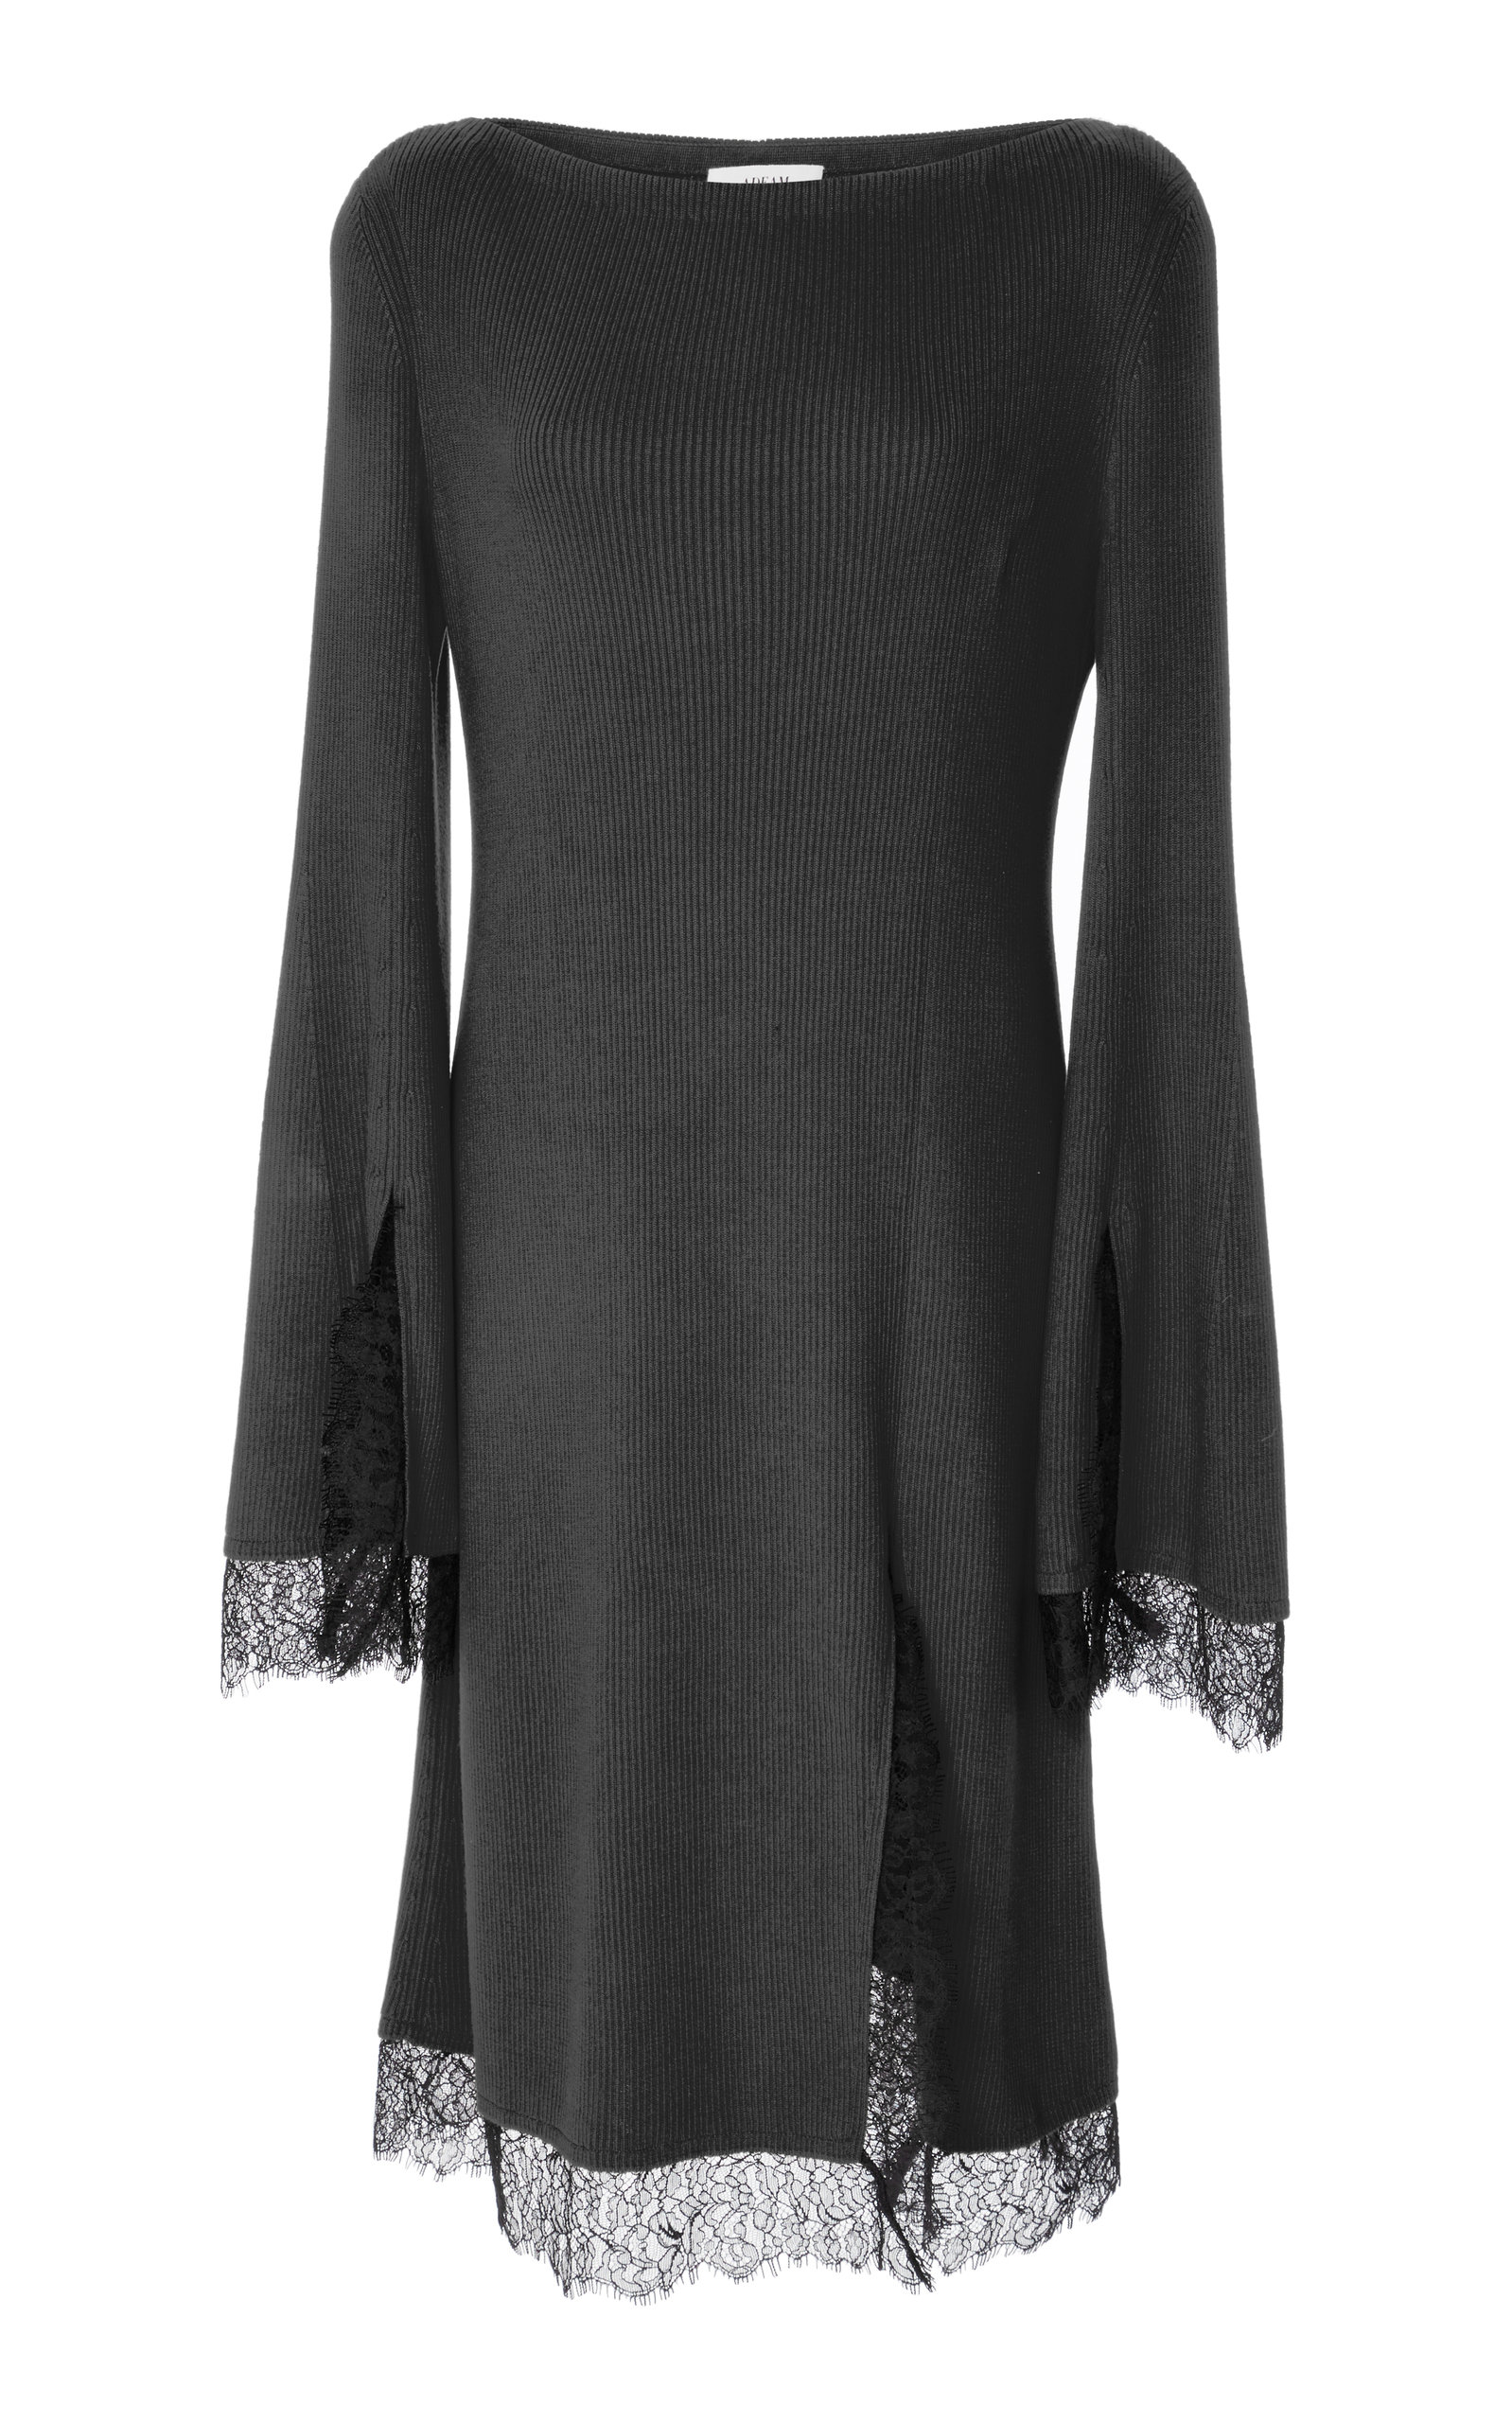 ADEAM Lace Trimmed Slit Knit Dress, Black